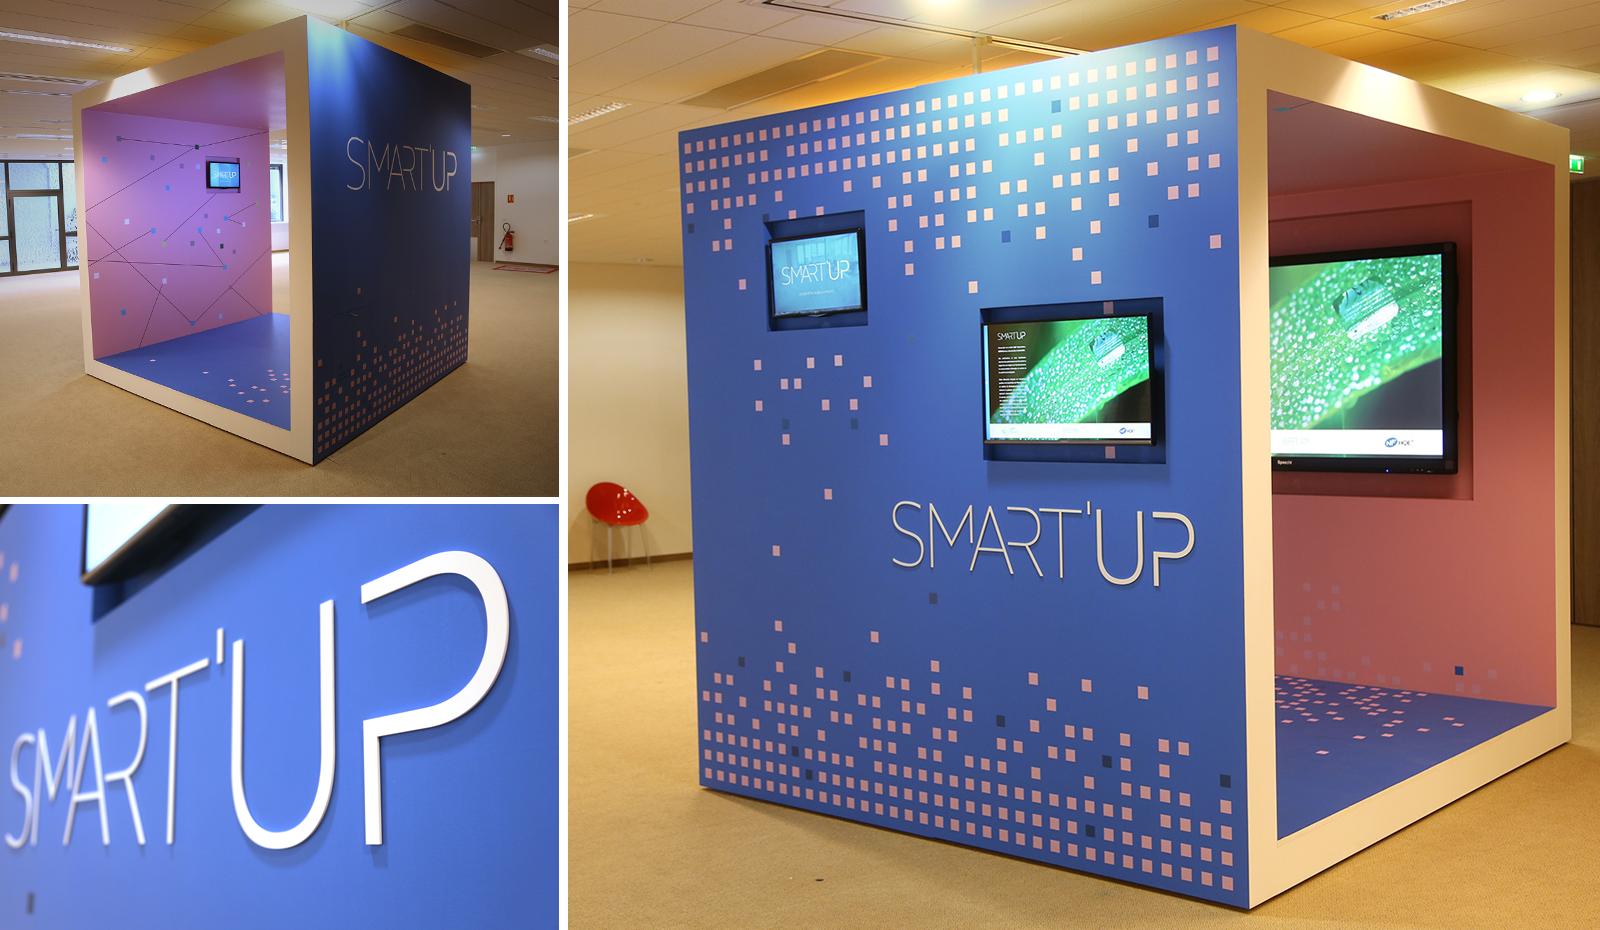 SmartUp cube13i - Smart'Up